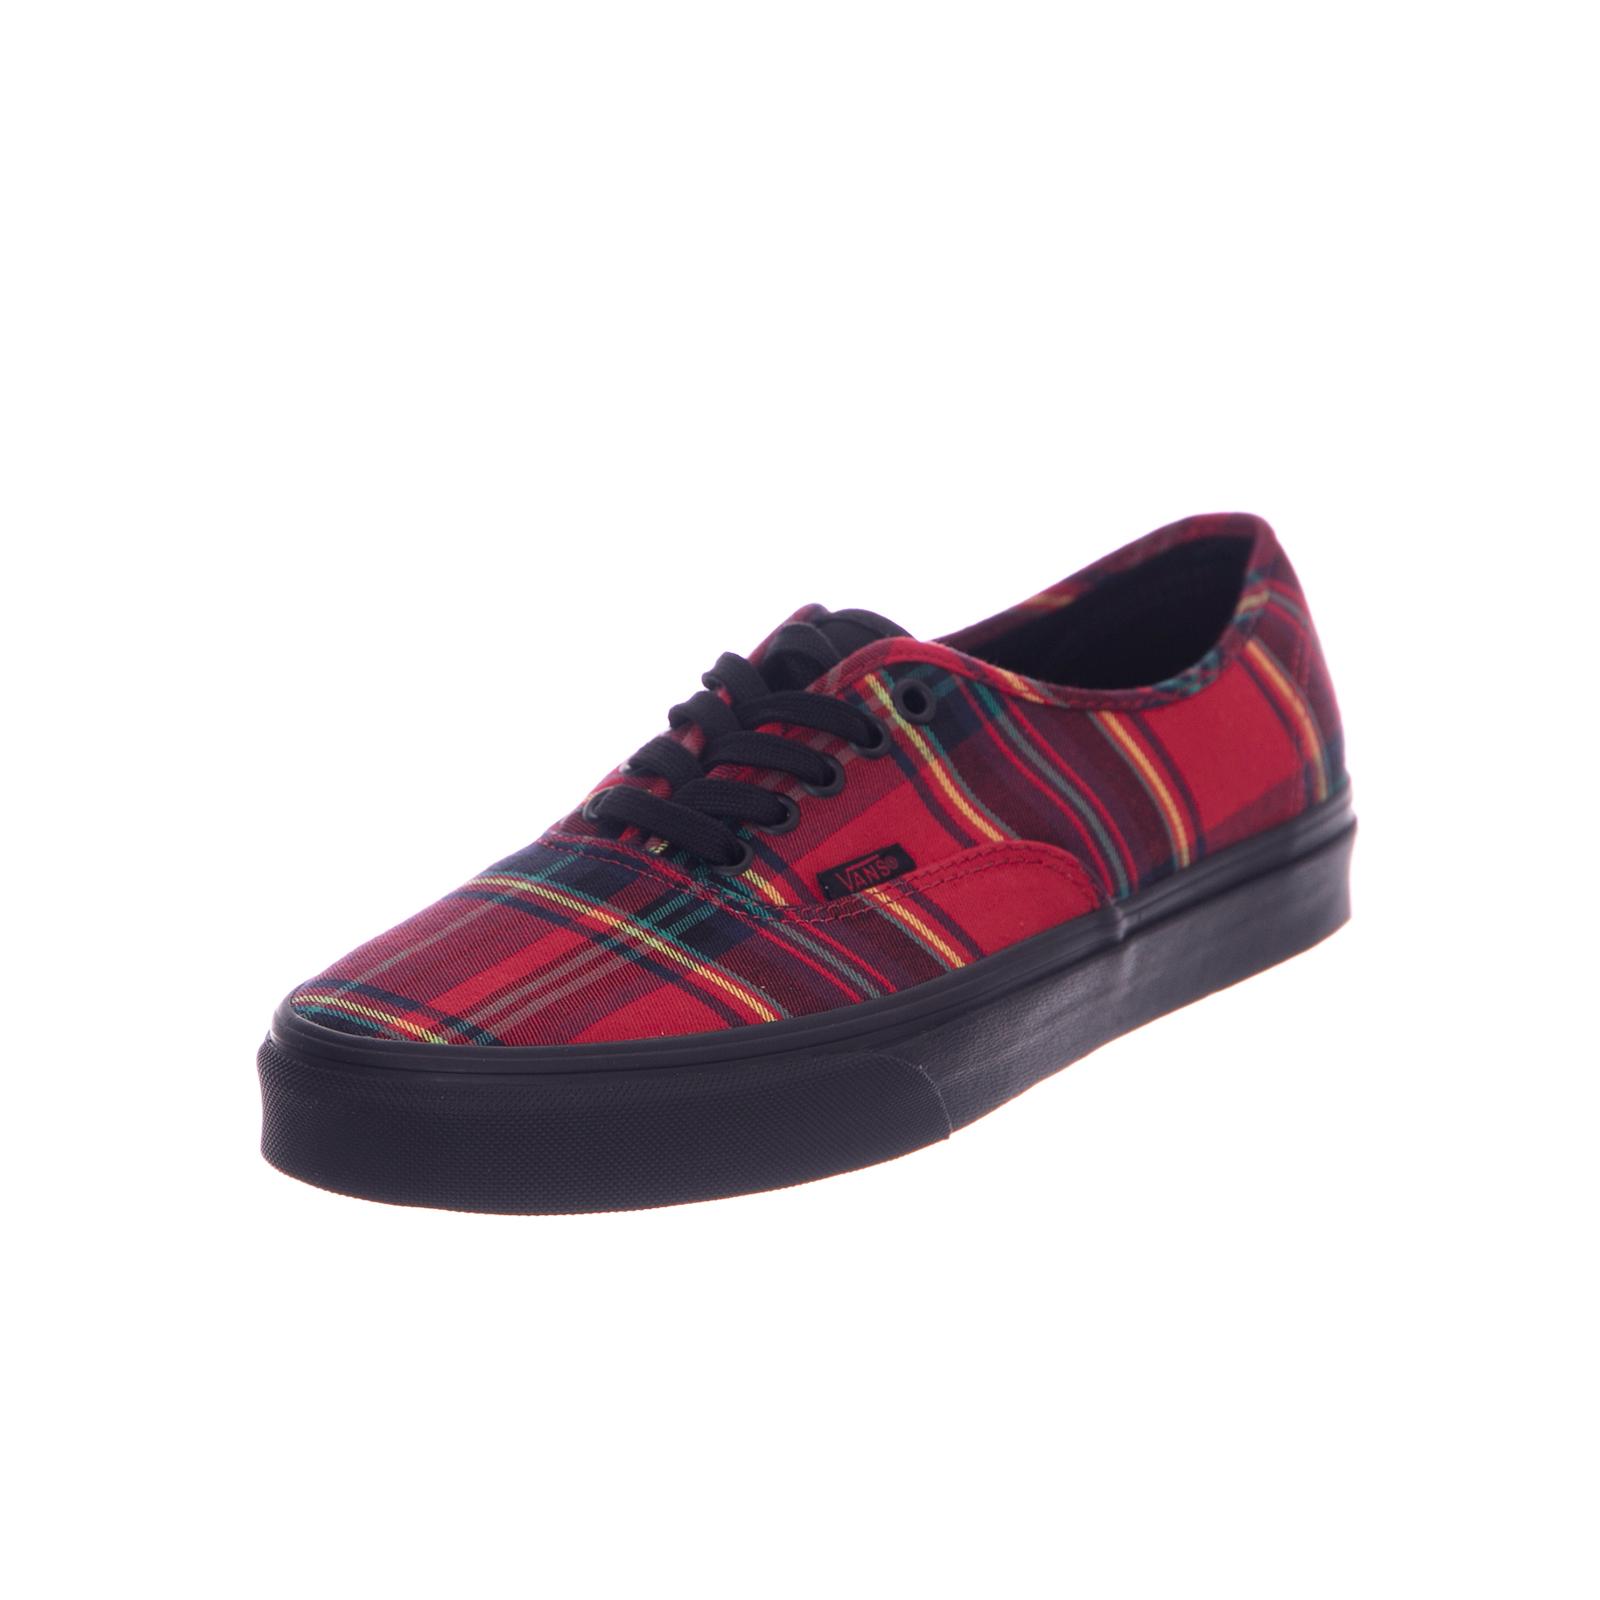 7d4f6b8dcc Vans Sneakers U Authentic Plaid Mix Red Black Rosso